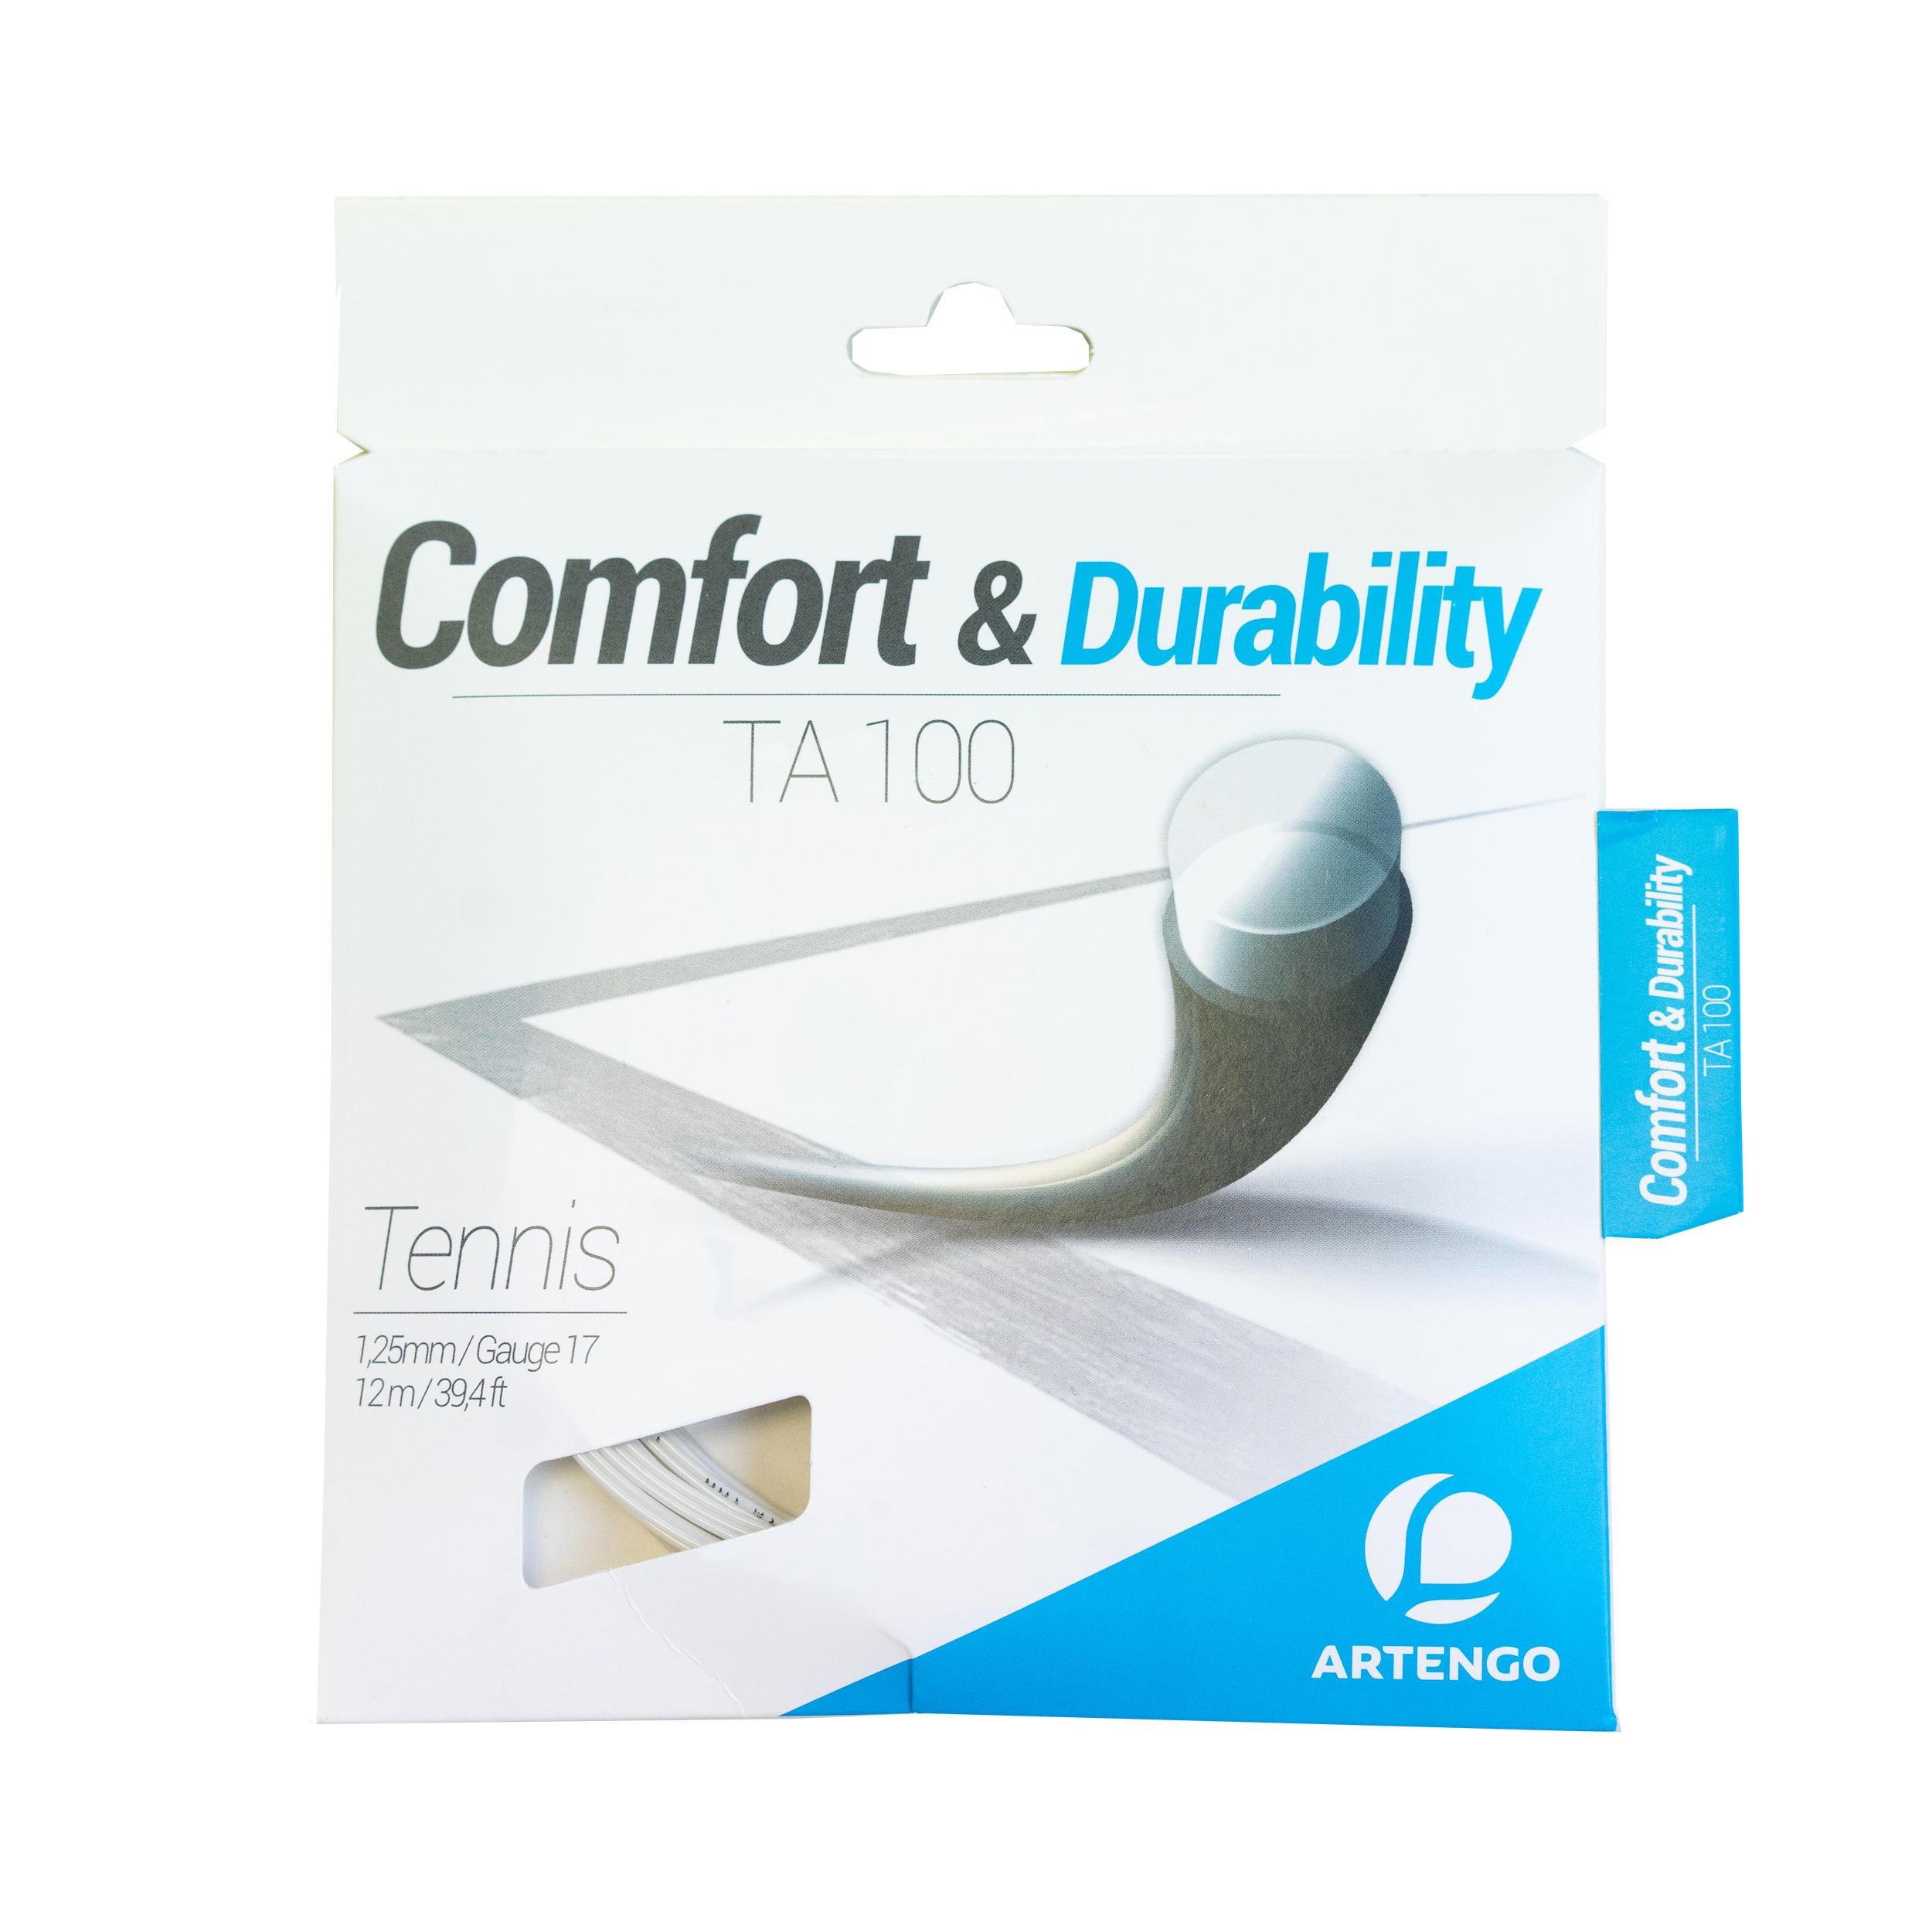 Comprar Cordajes de tenis online  52727c2159bd5